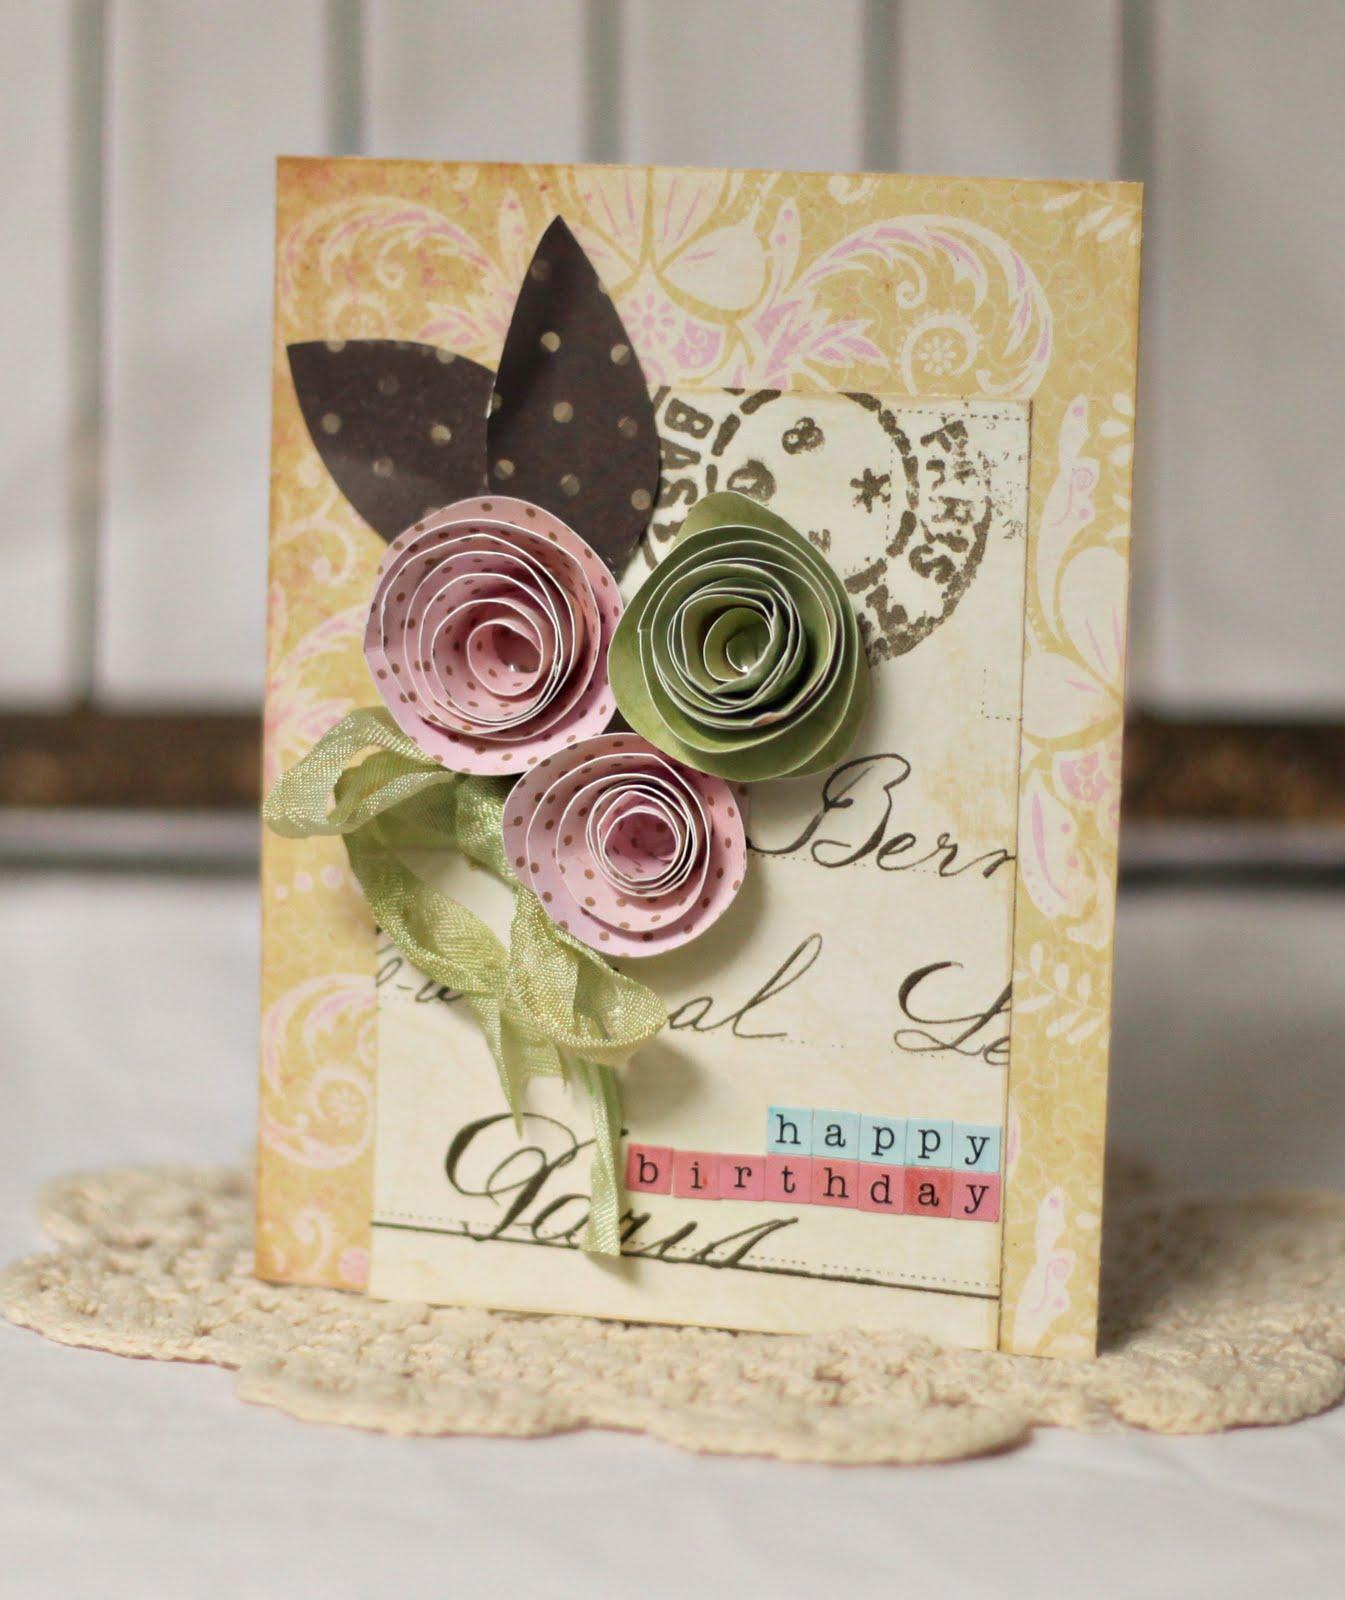 Pixie dust paperie designer day 3 happy birthday card by kandis smith designer day 3 happy birthday card by kandis smith bookmarktalkfo Gallery